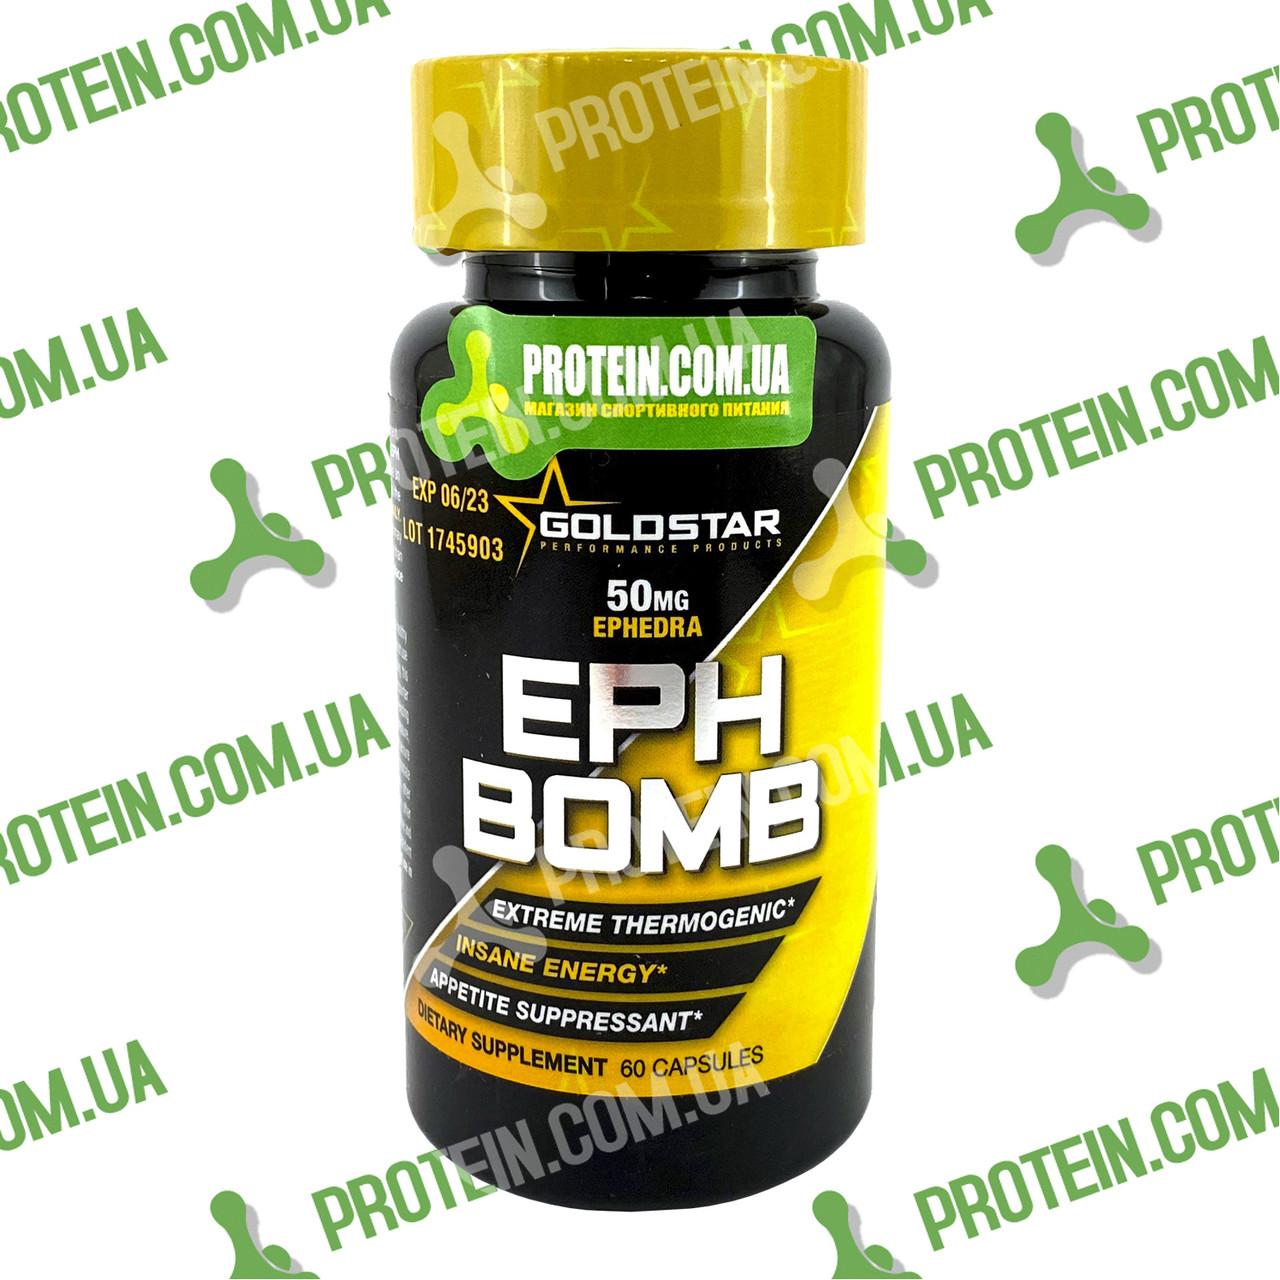 Жіросжігателя Gold Star EPH BOMB 50 мг, 60 кап.